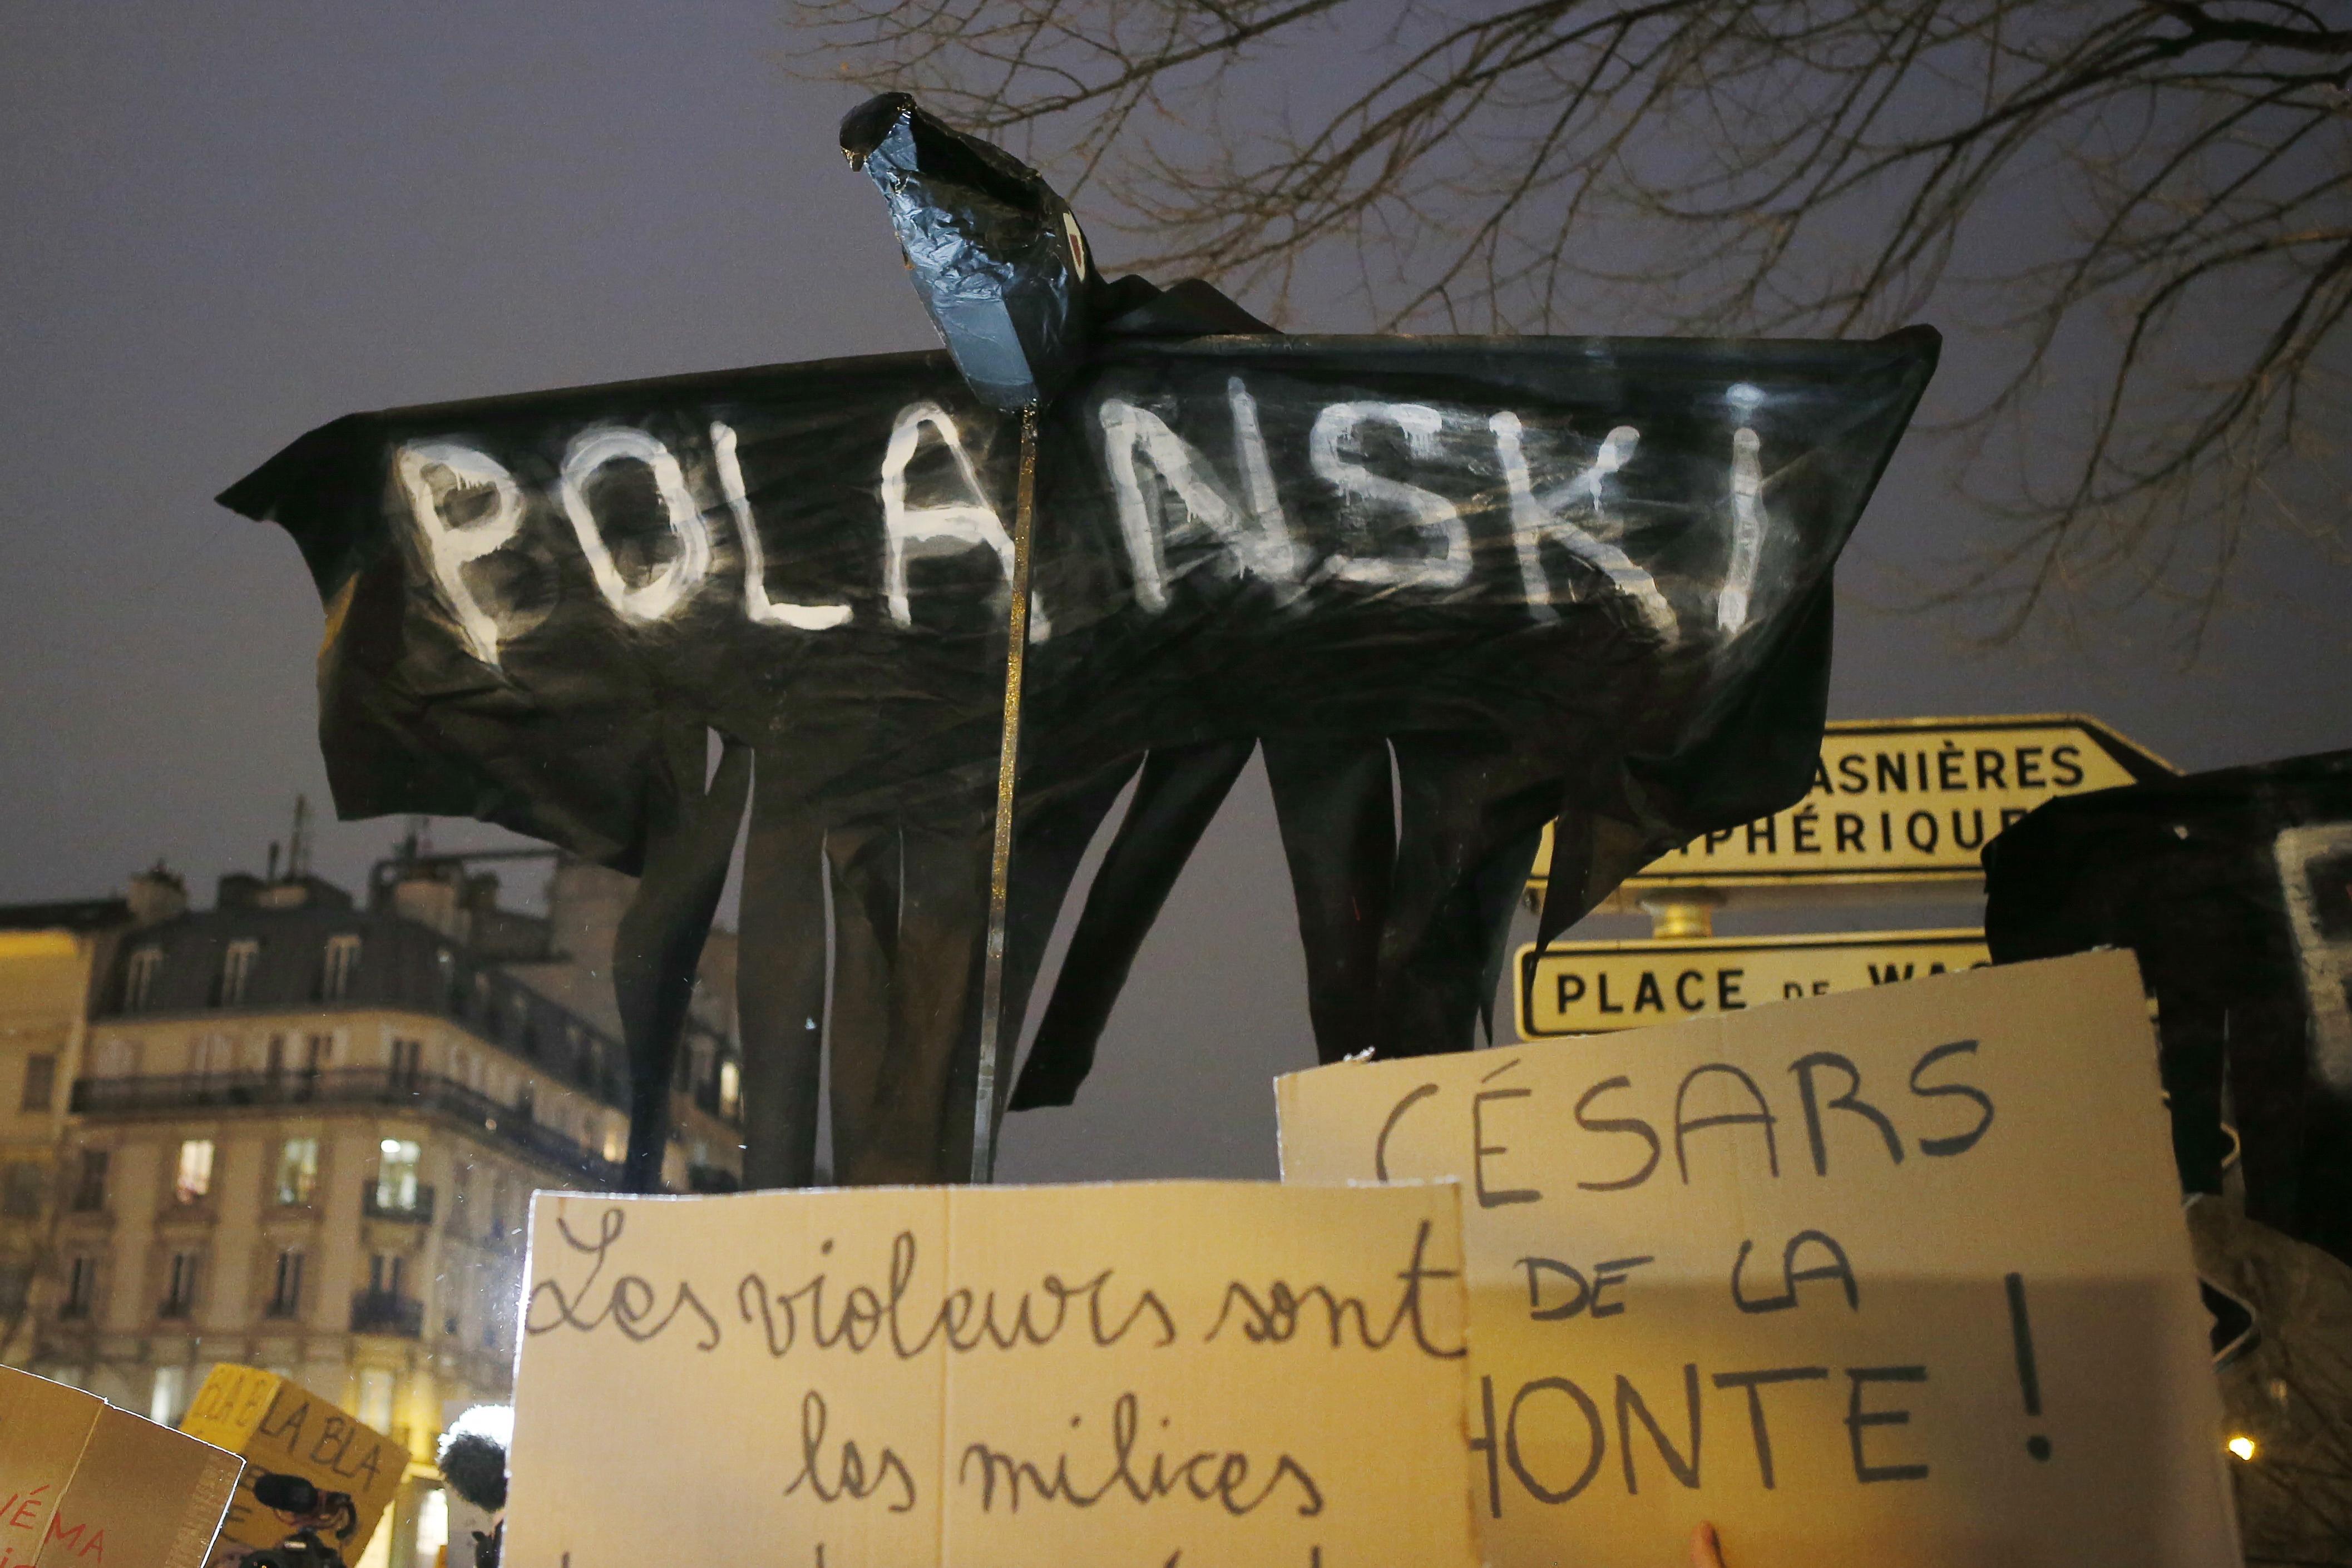 Feminist protest against Roman Polanski at the 2020 Cesars awards45th Cesar Awards, Protests, Paris, France - 28 Feb 2020